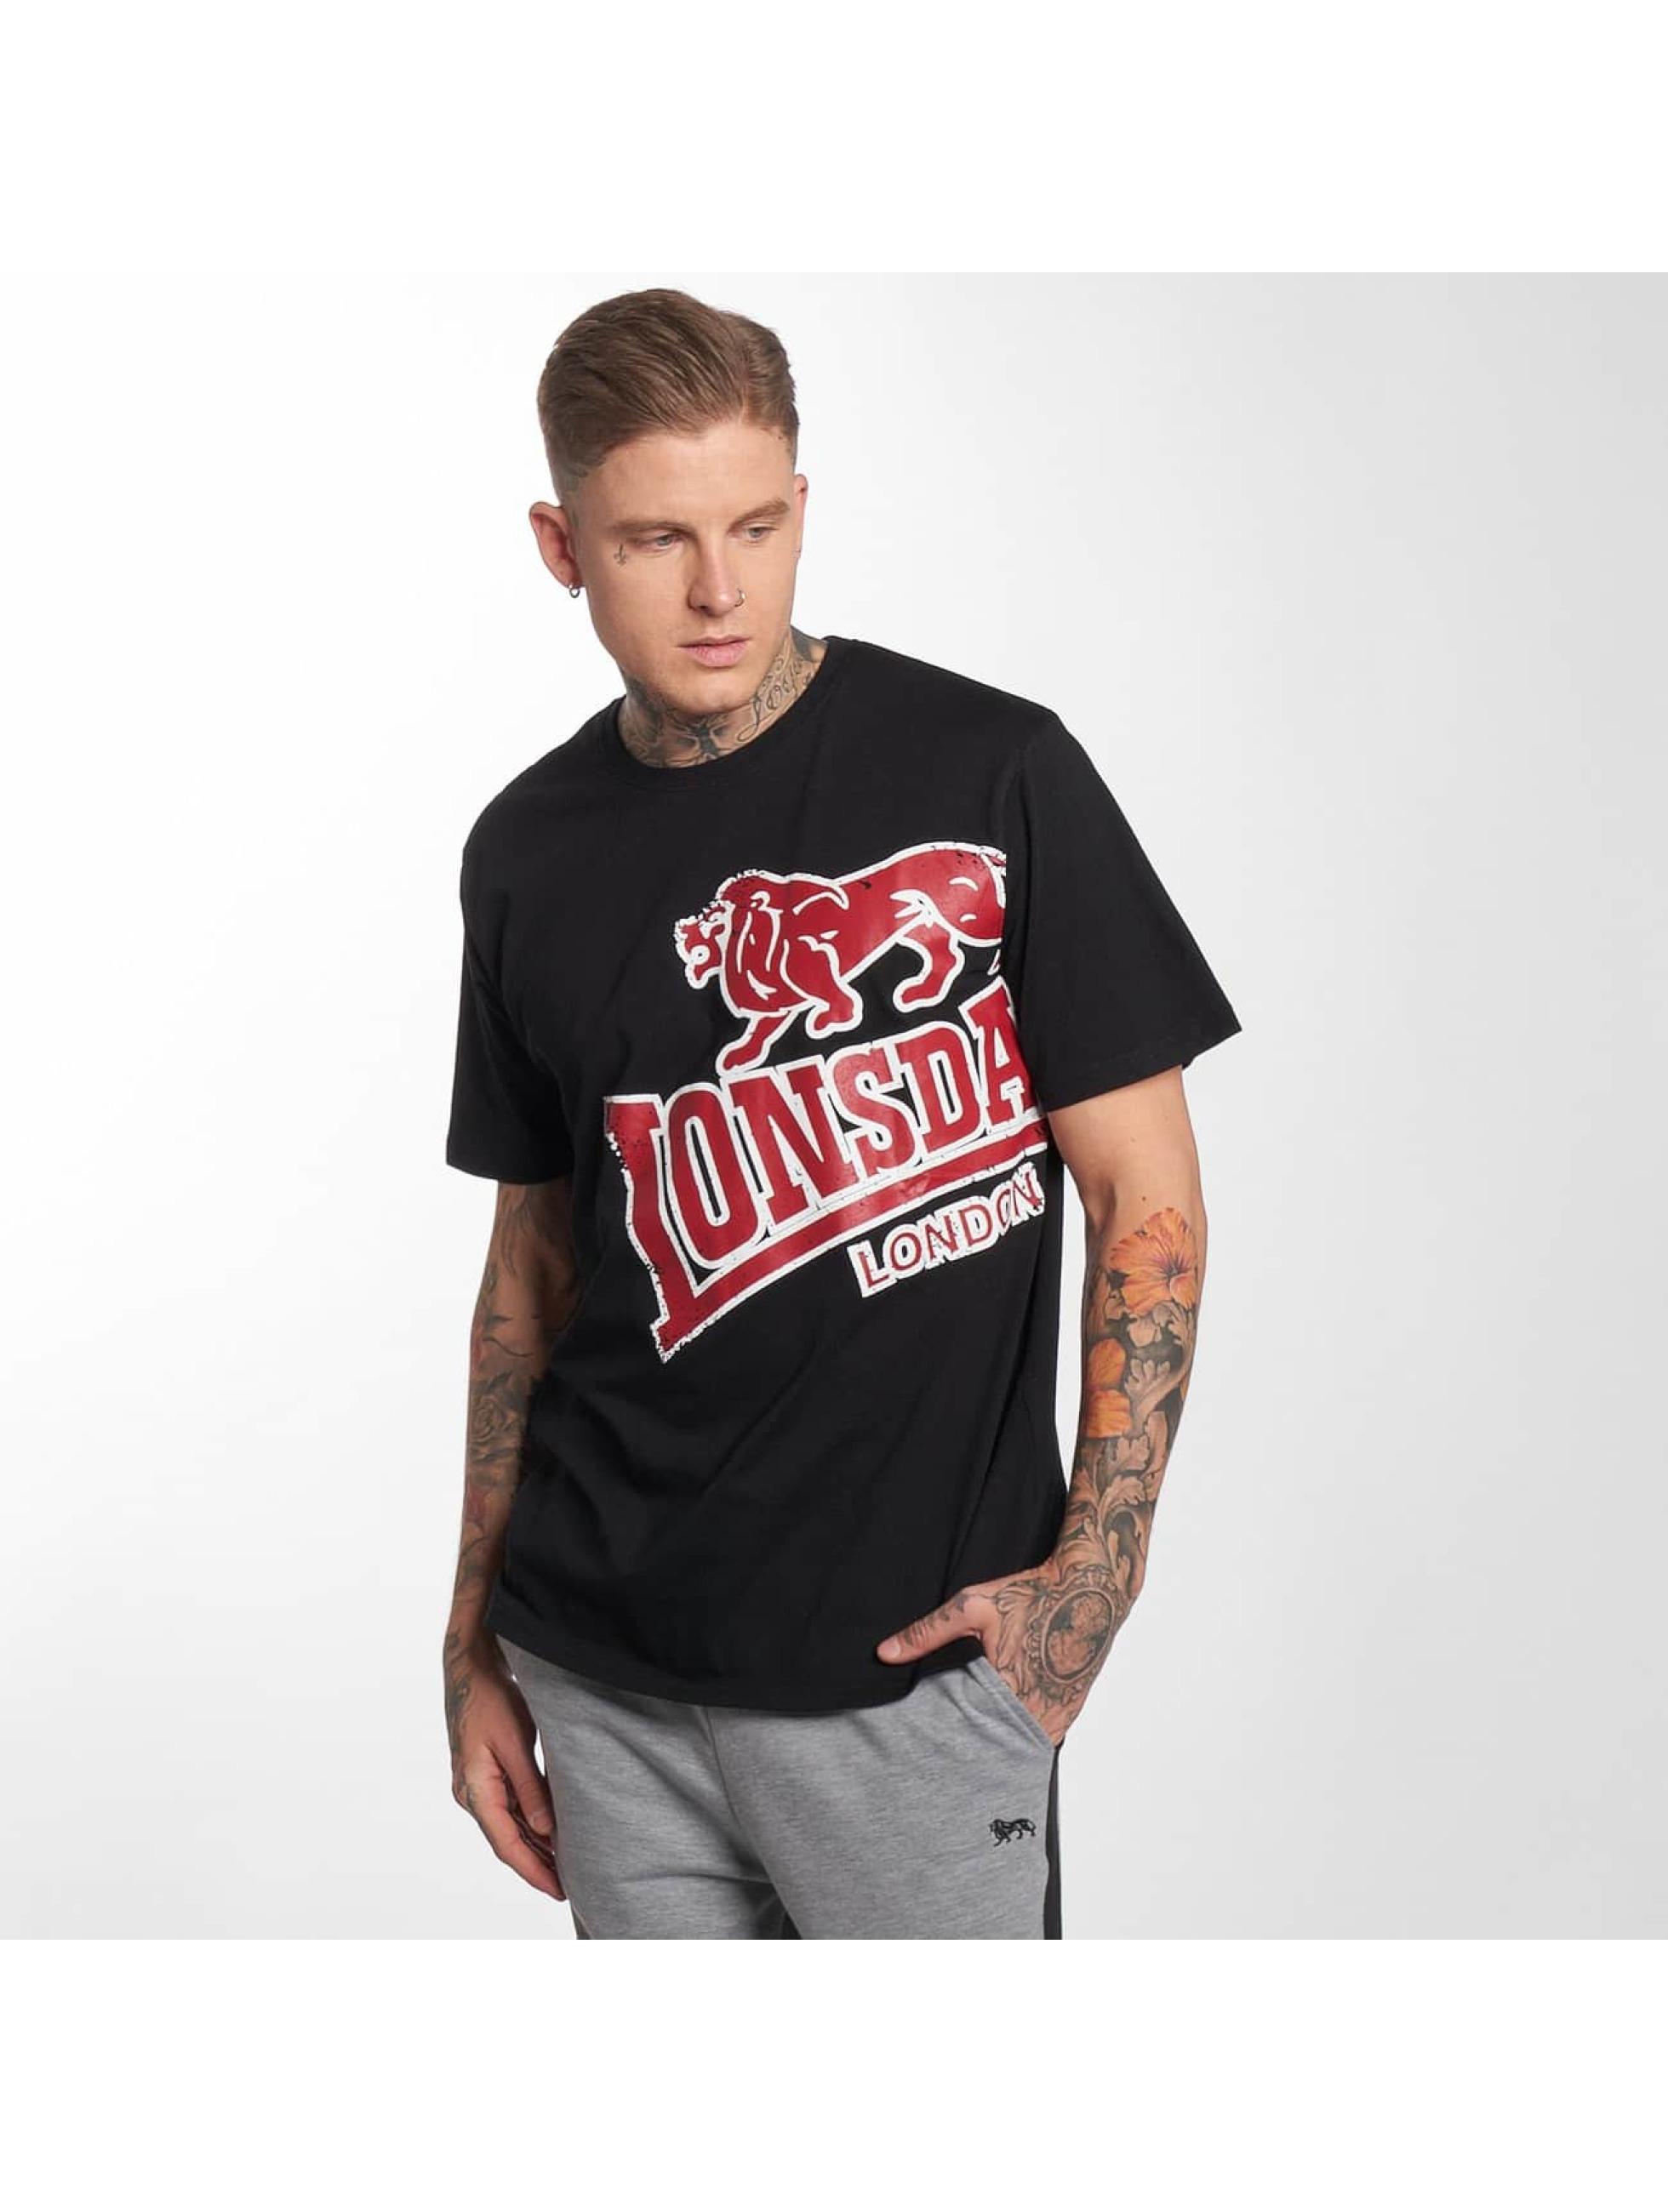 Lonsdale London T-Shirt Plush black